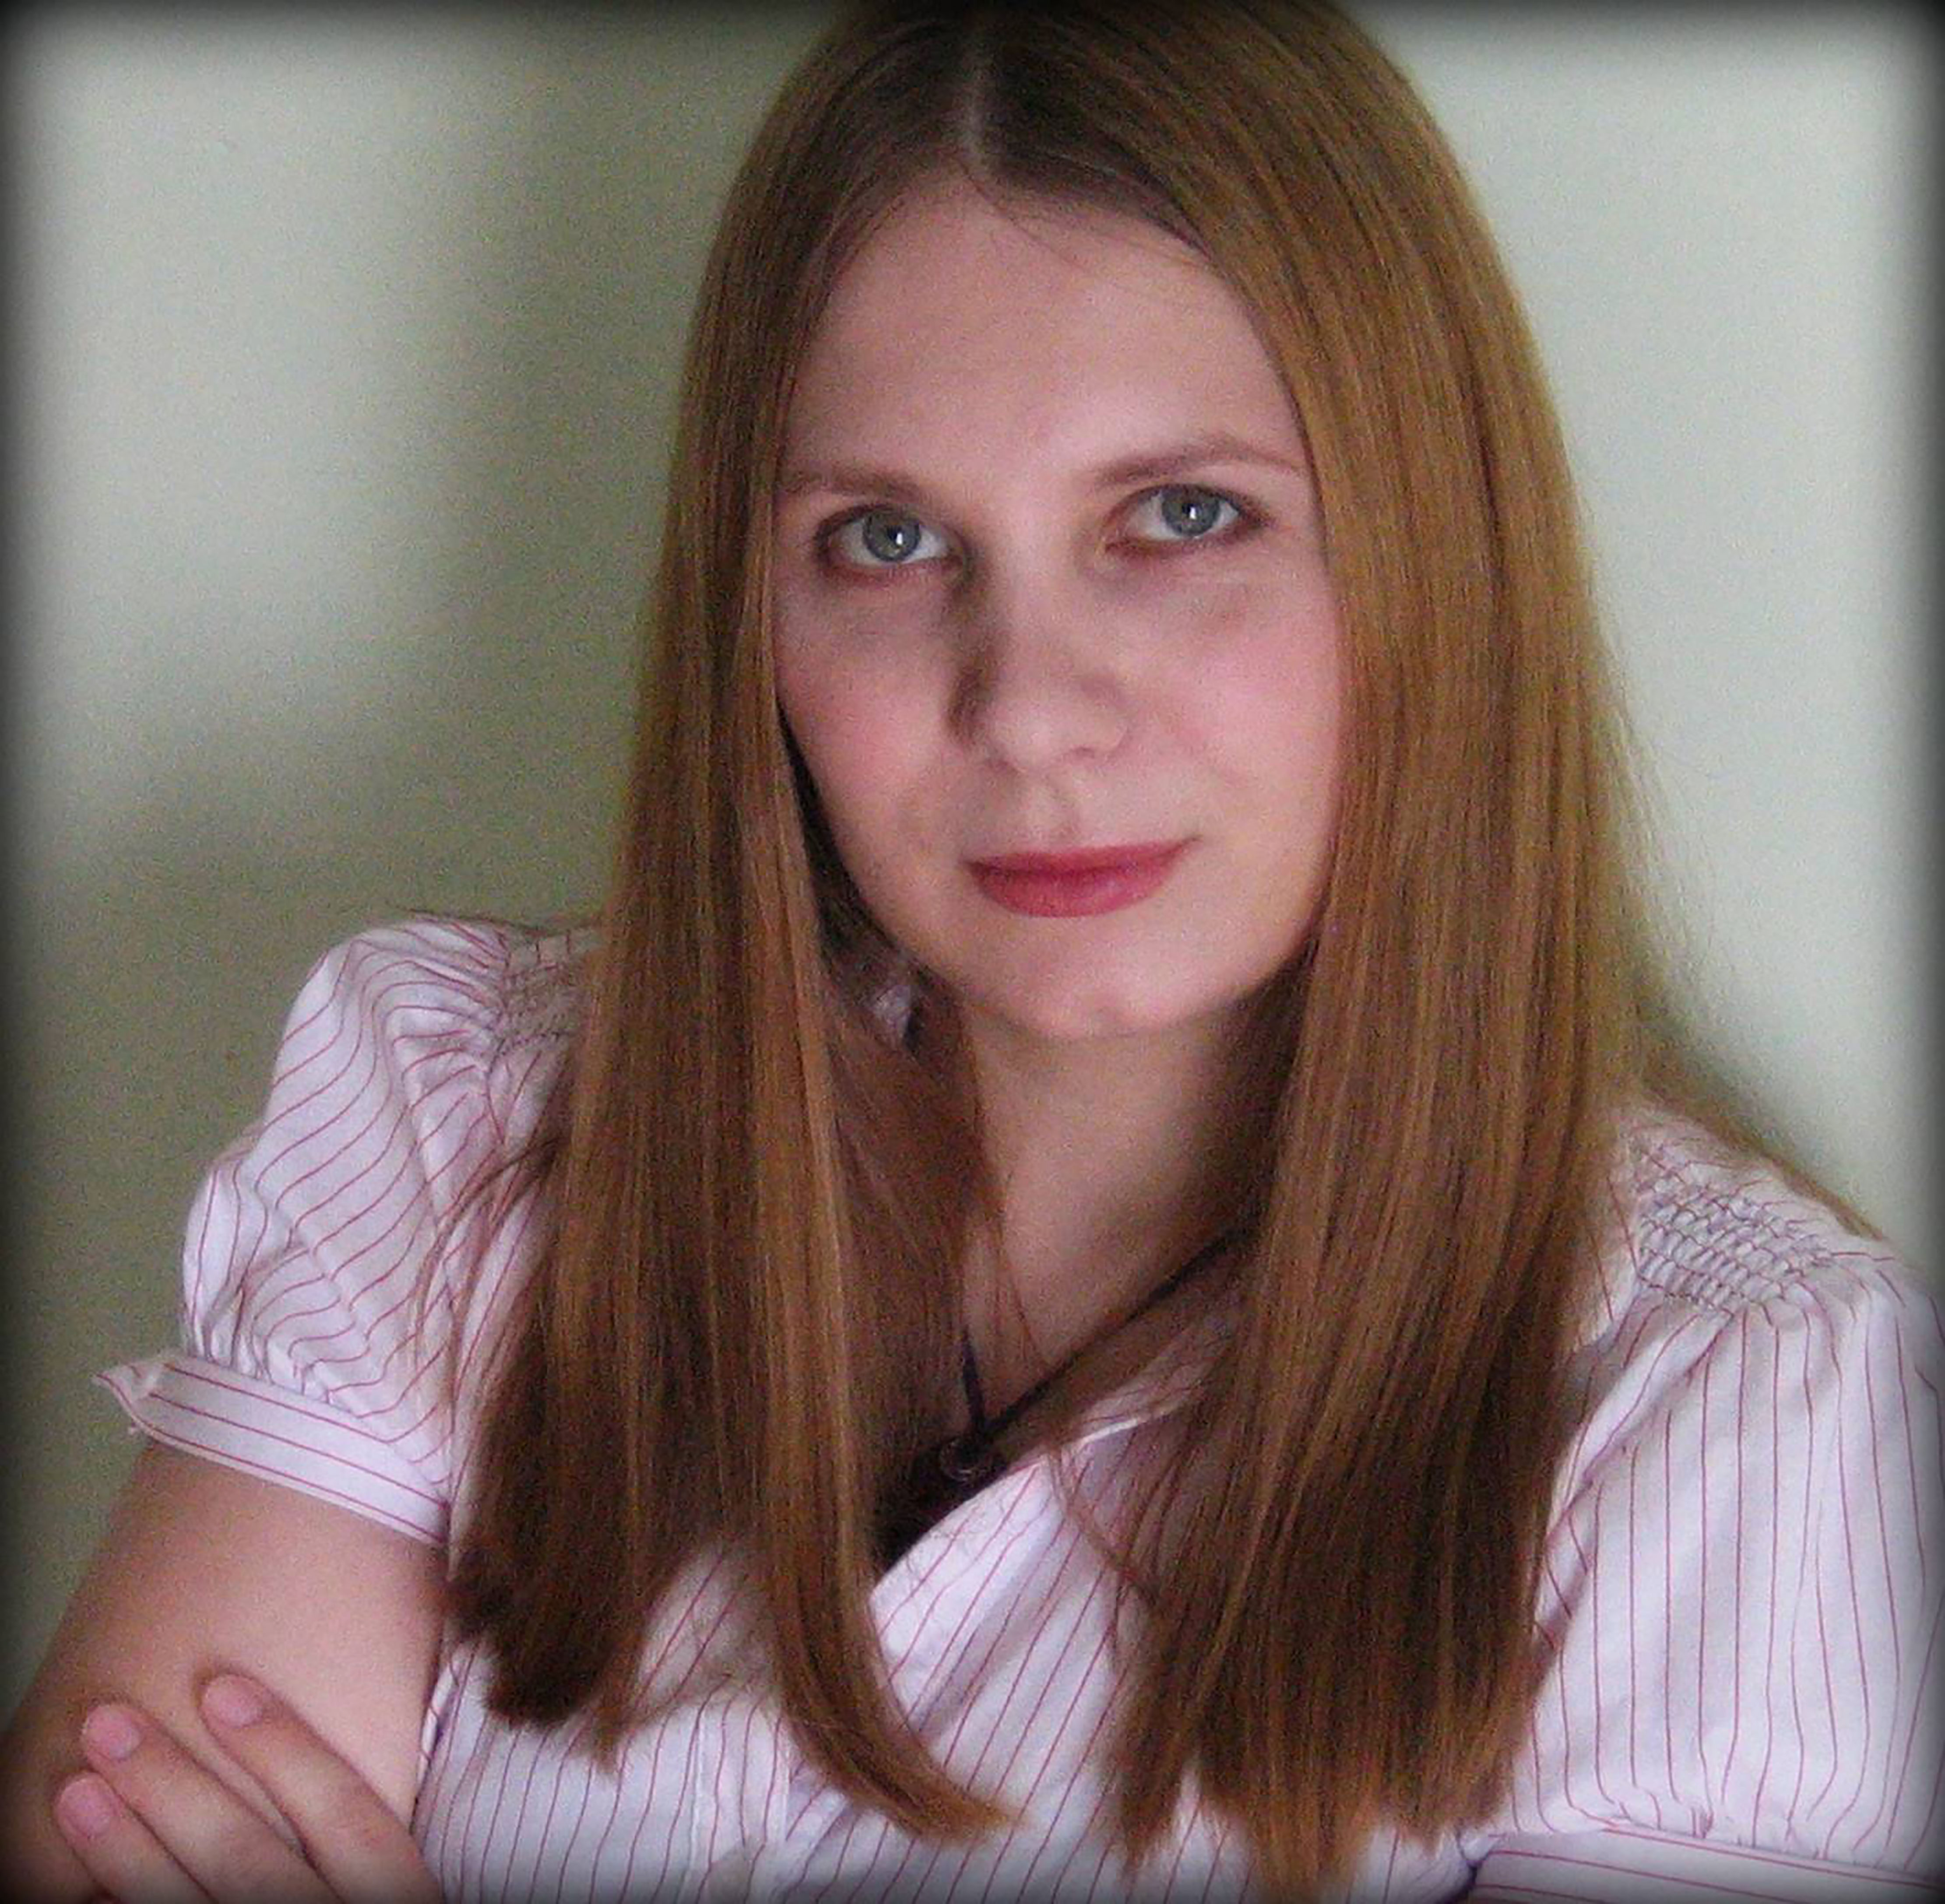 Amra Pajalić